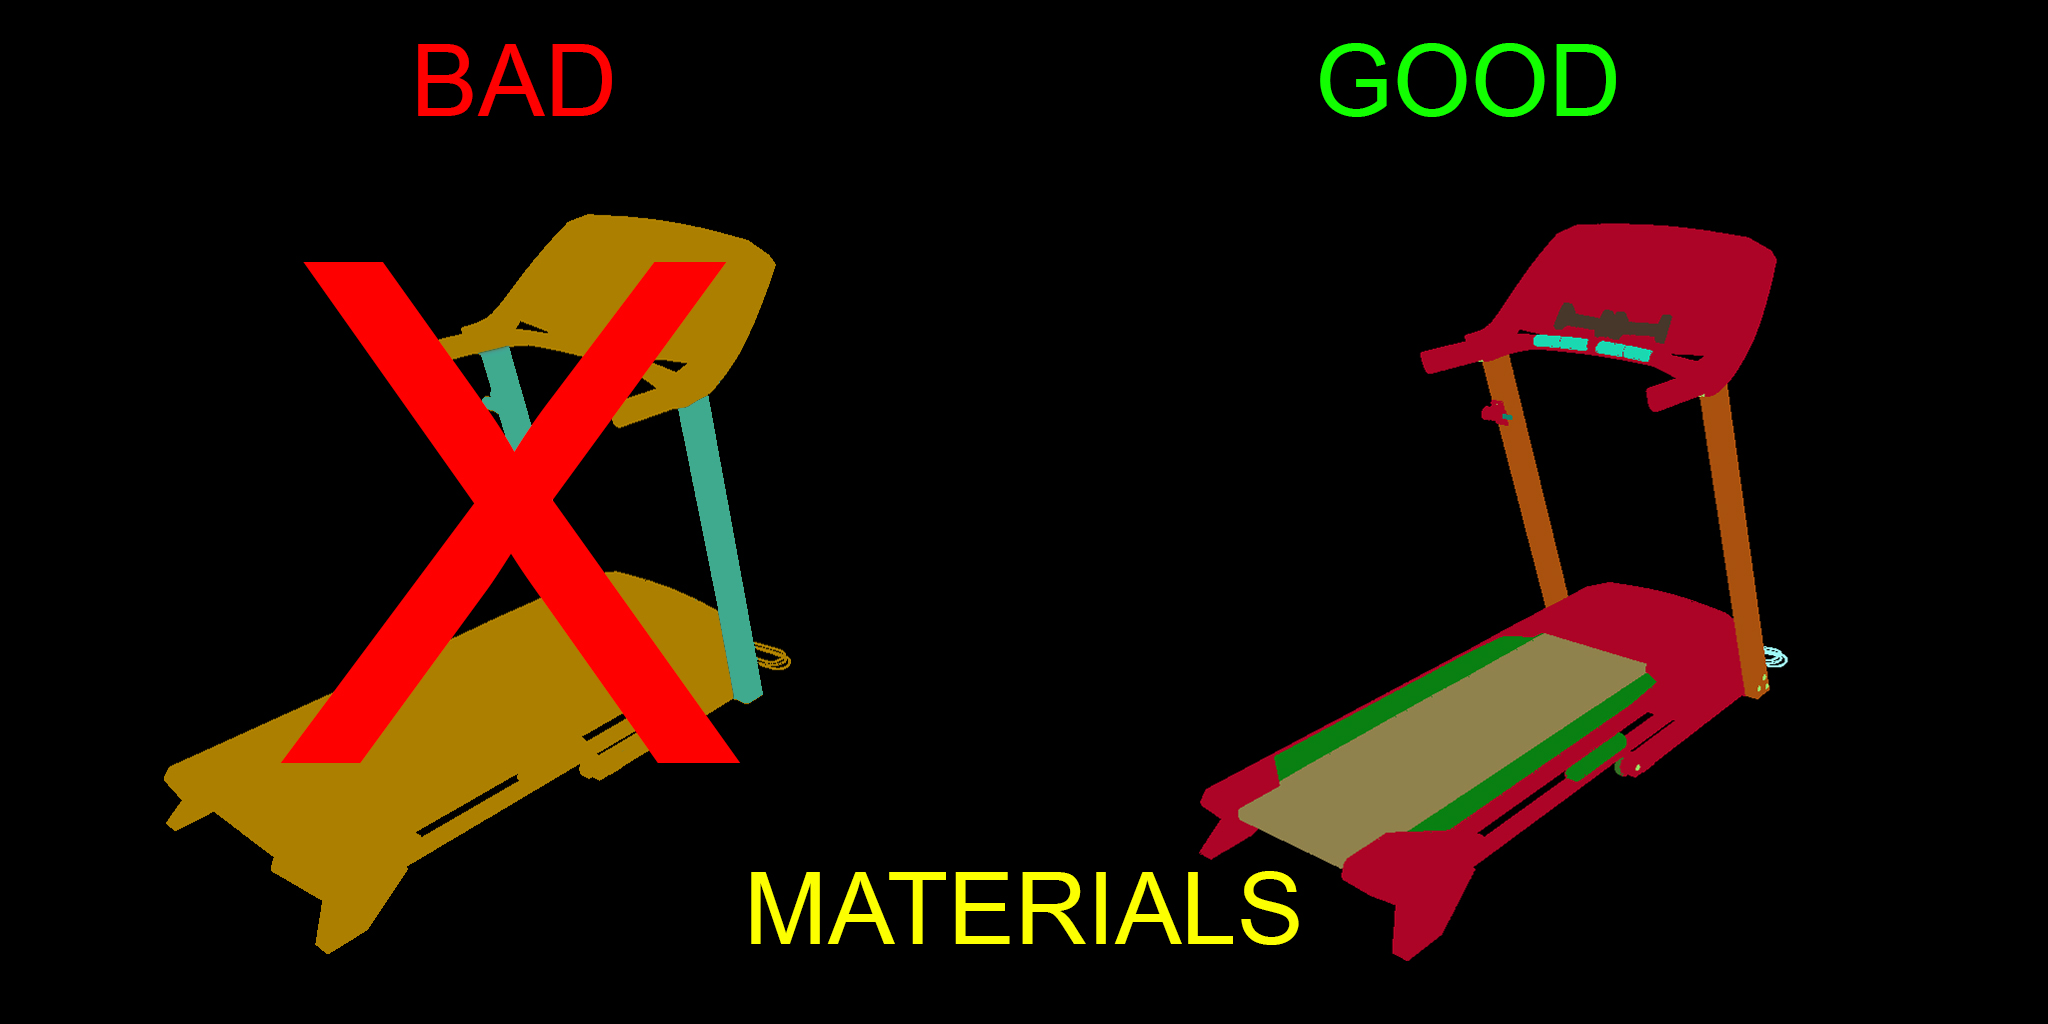 Treadmill_GoodvBad_Bad